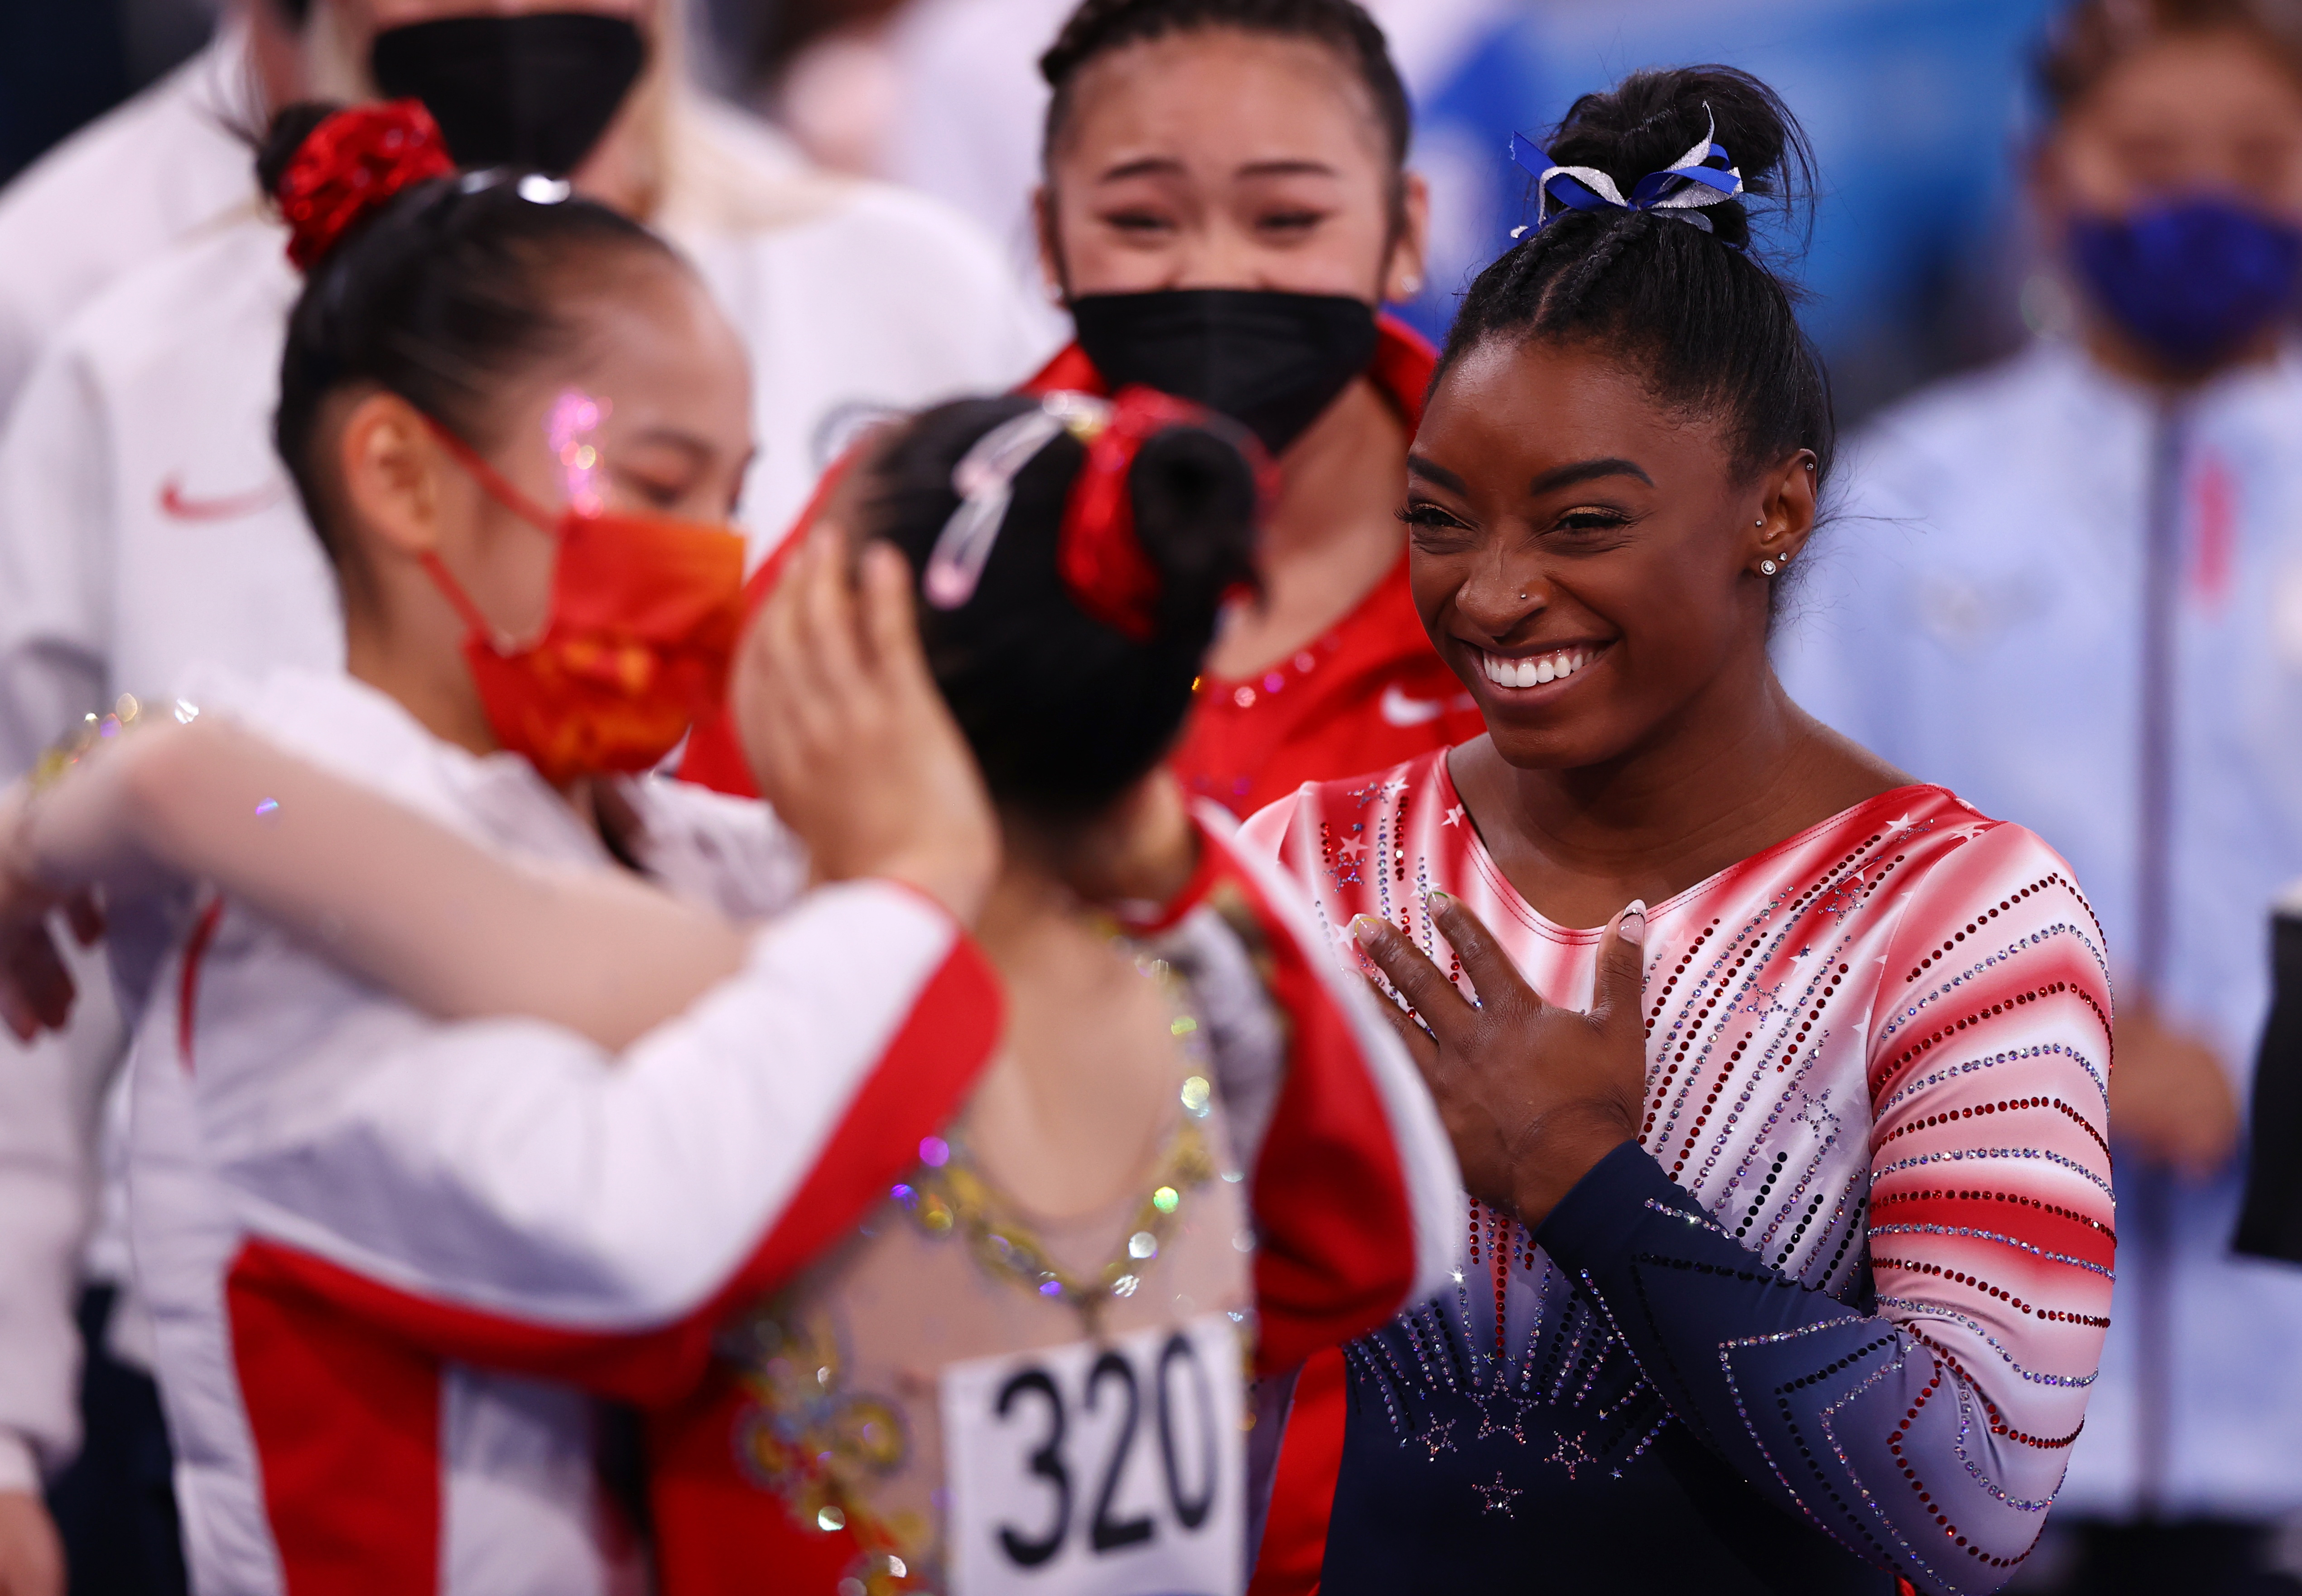 Tokyo 2020 Olympics - Gymnastics - Artistic - Women's Beam - Final - Ariake Gymnastics Centre, Tokyo, Japan - August 3, 2021. Simone Biles of the United States reacts. REUTERS/Lisi Niesner